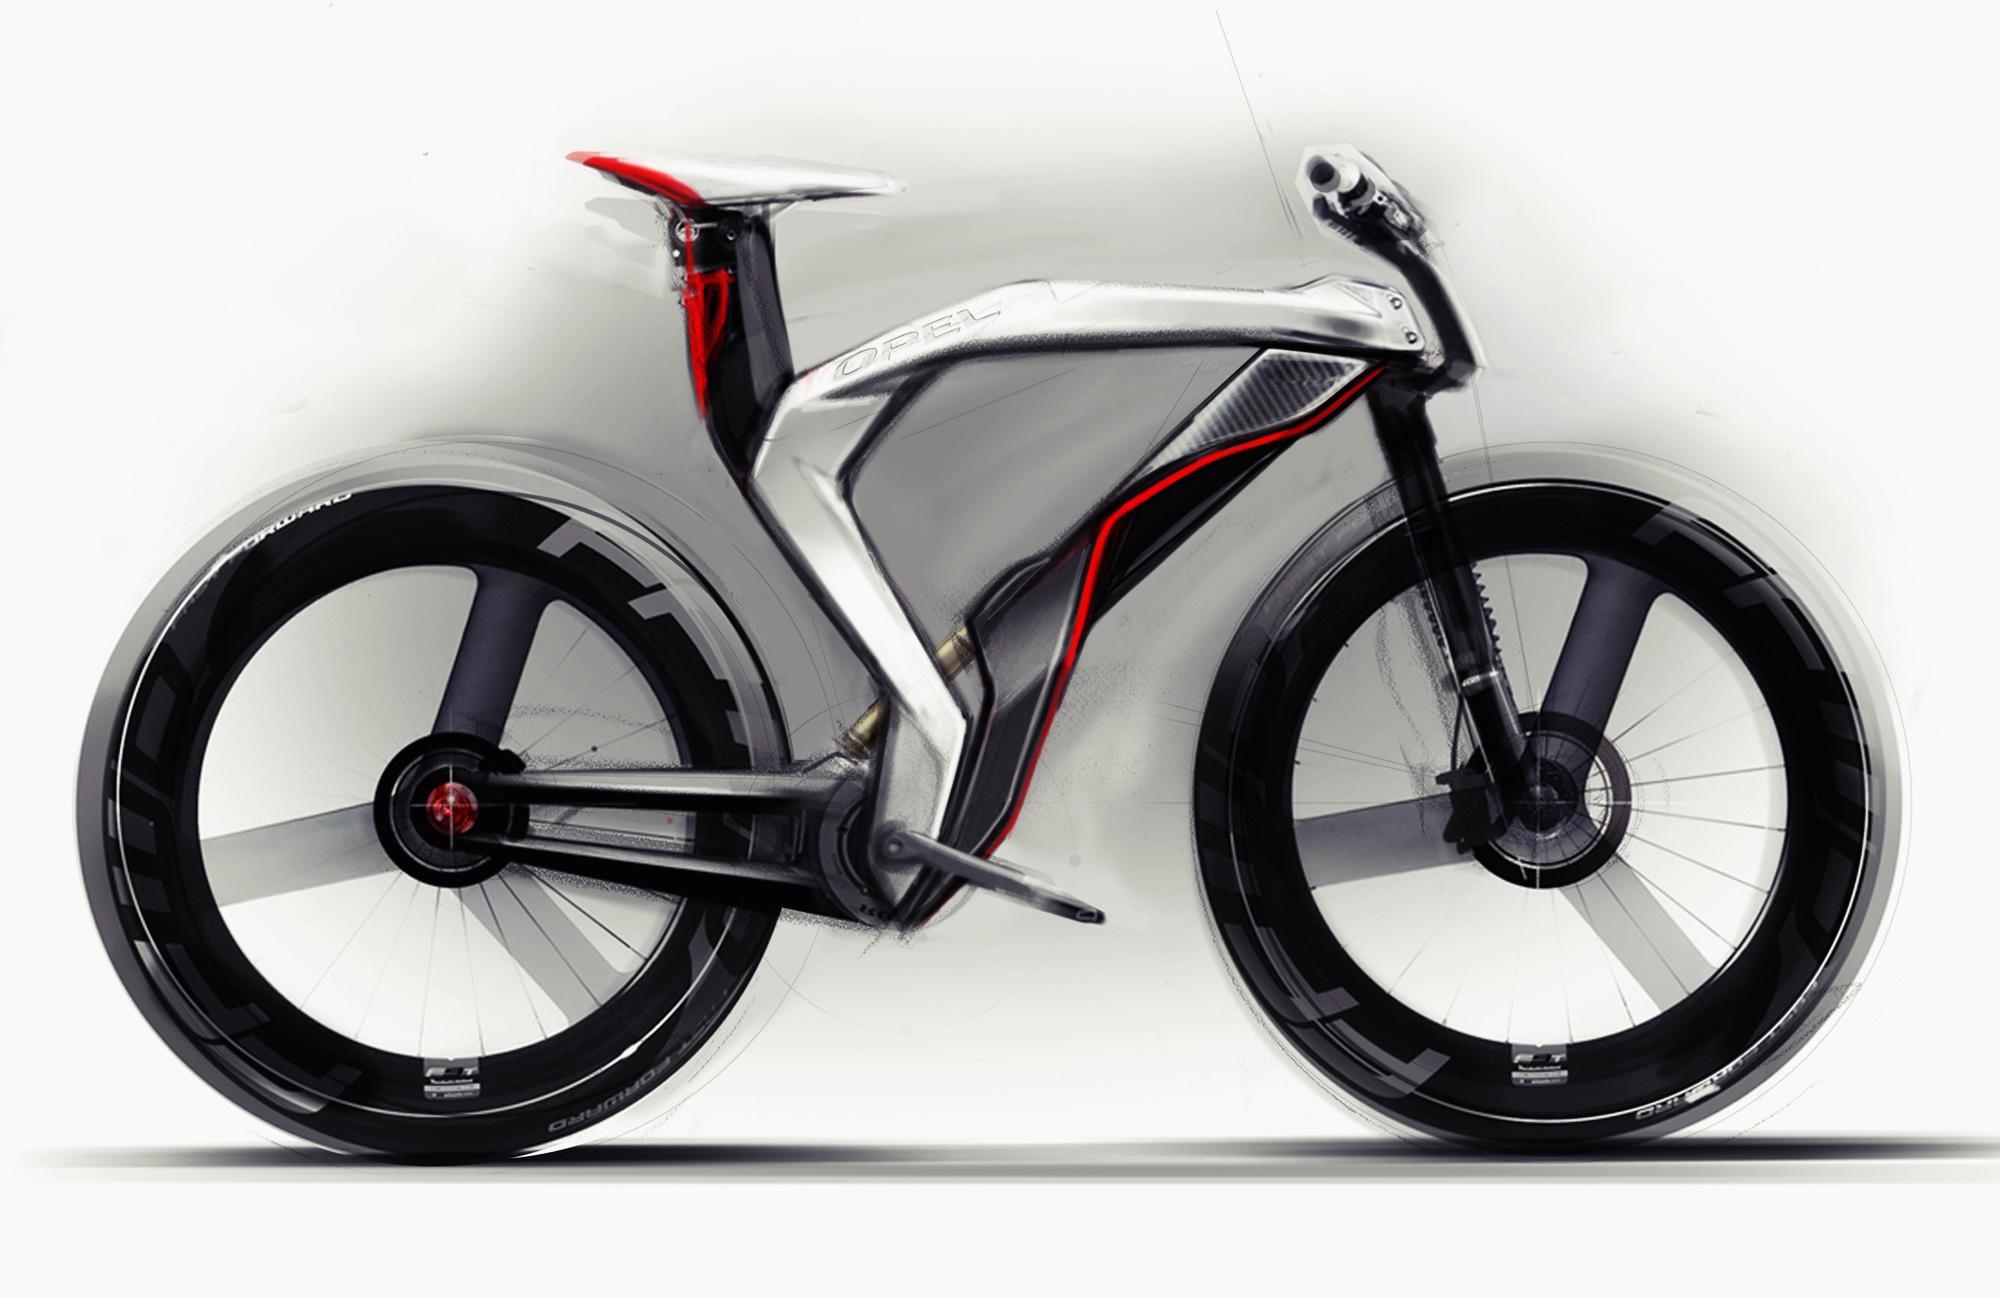 201203-kiska-opel-bike3.jpg (2000×1298)